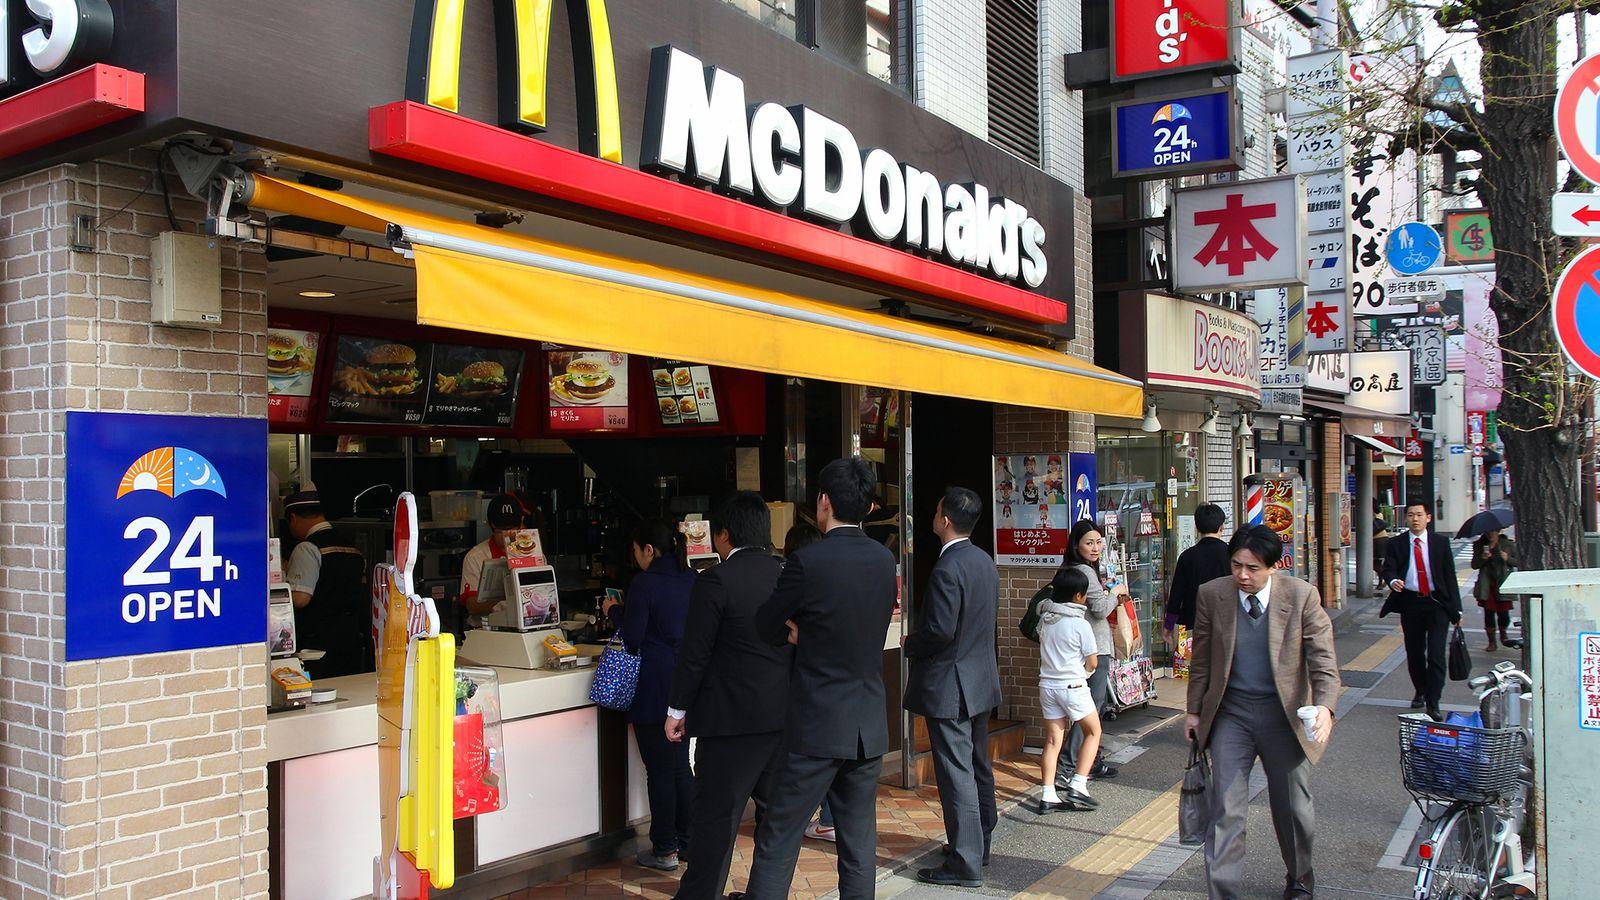 Mc Donalds Japan